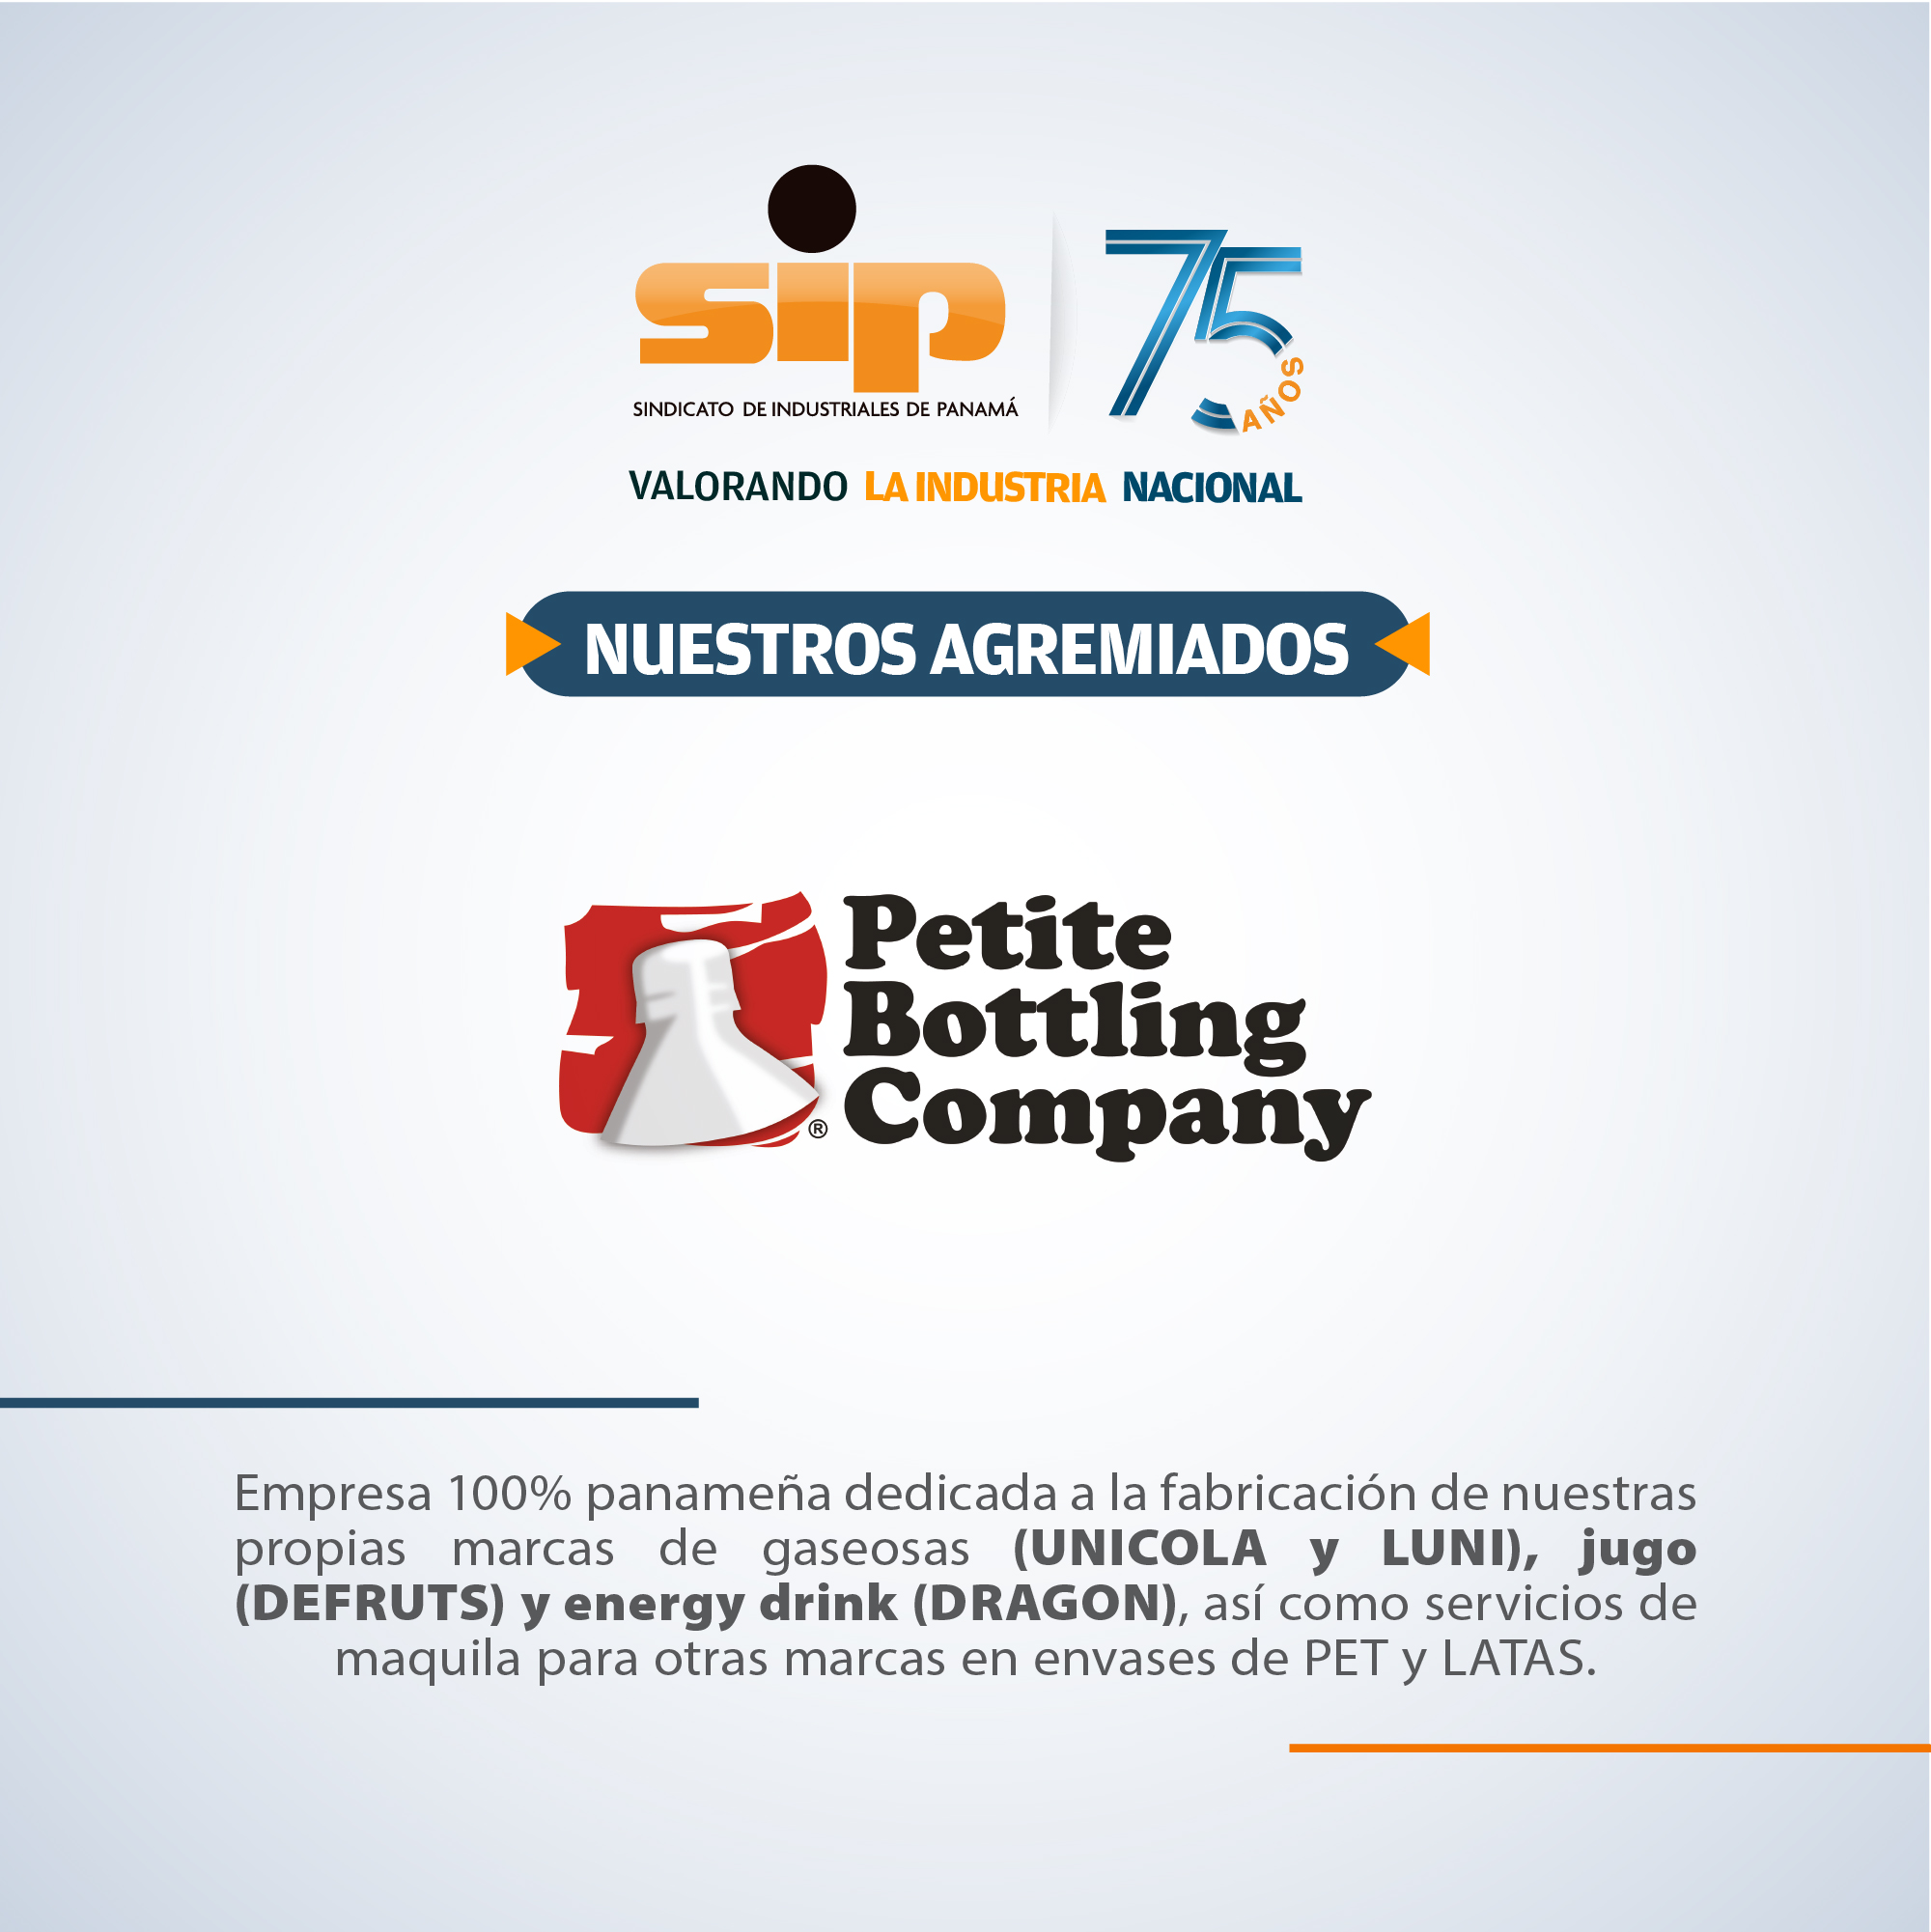 Petite Bottling Company